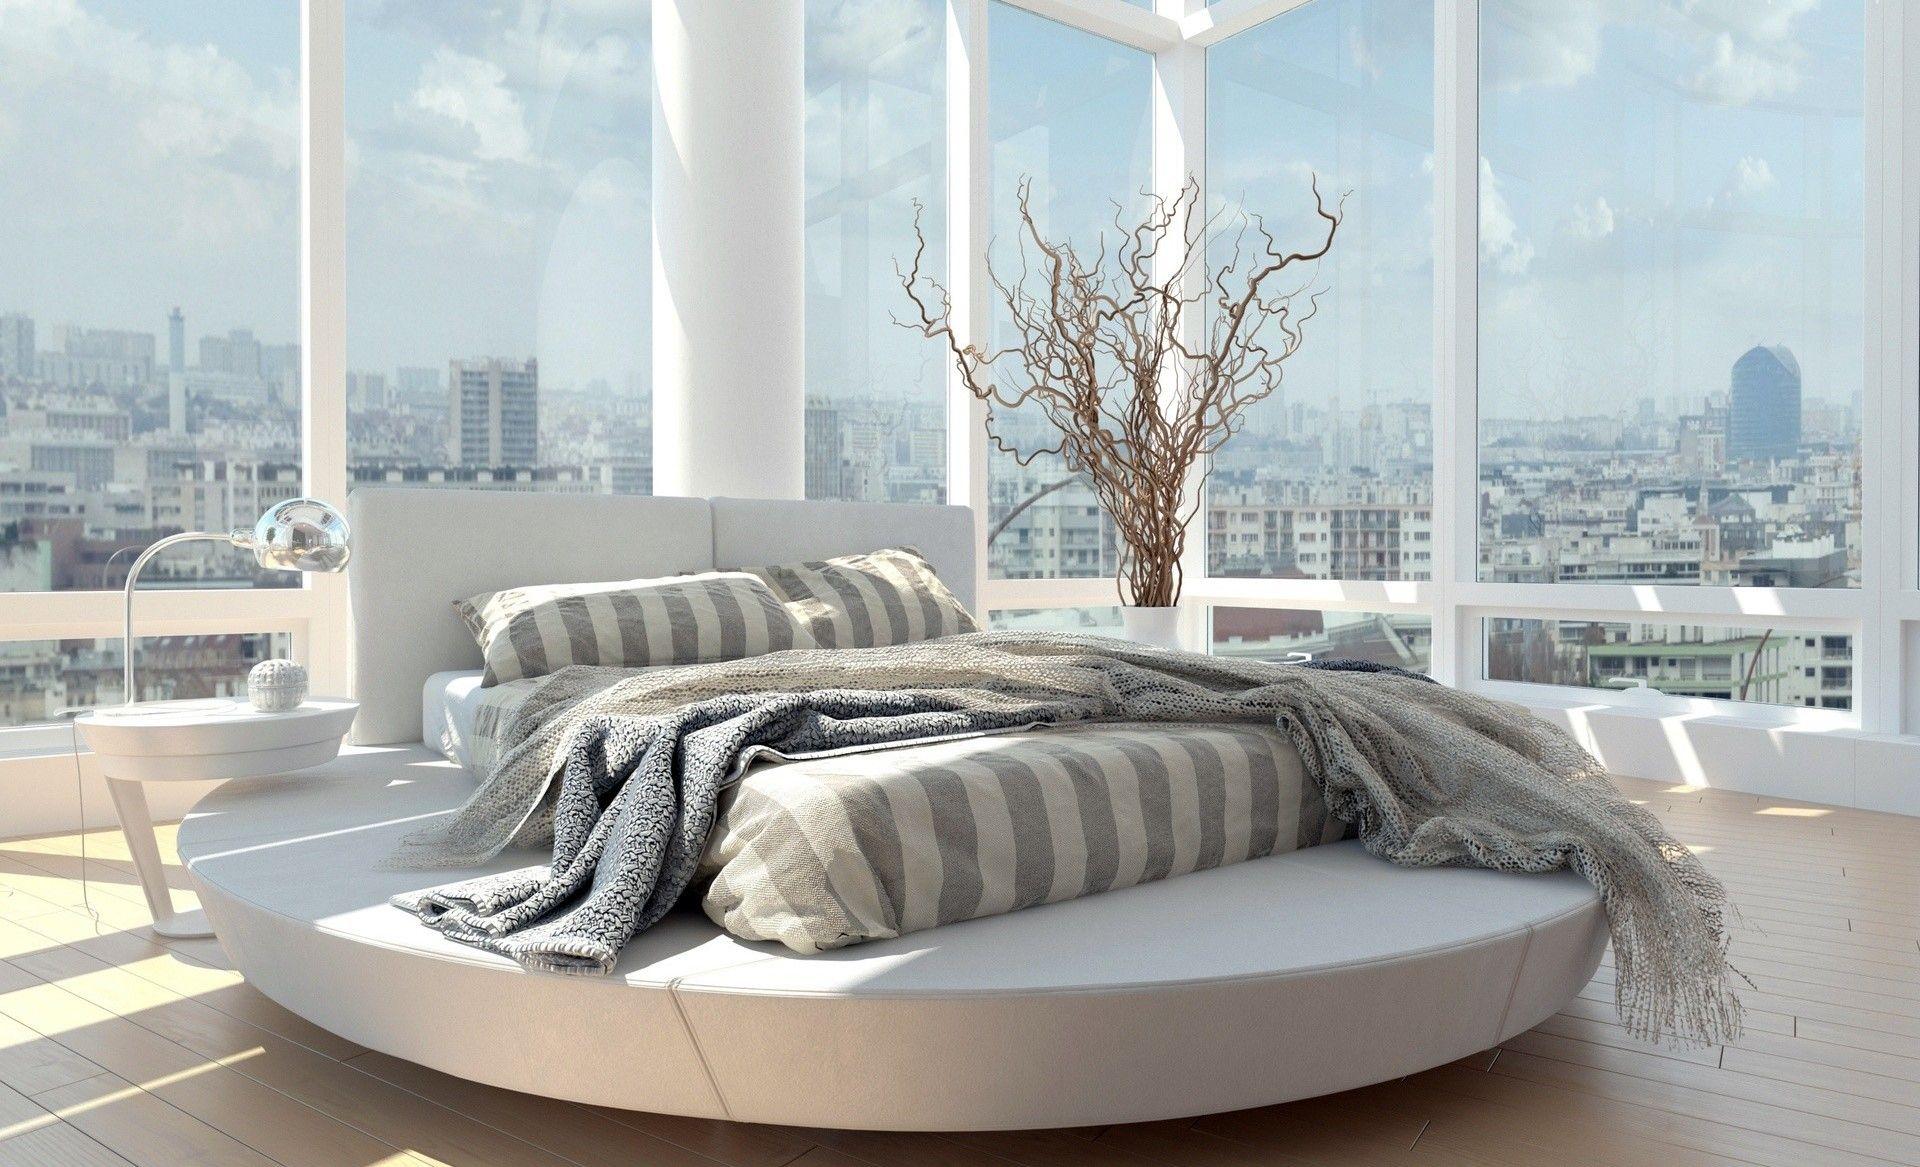 Circle Bed | Bedroom interior, Master bedroom design, Modern master bedroom  design